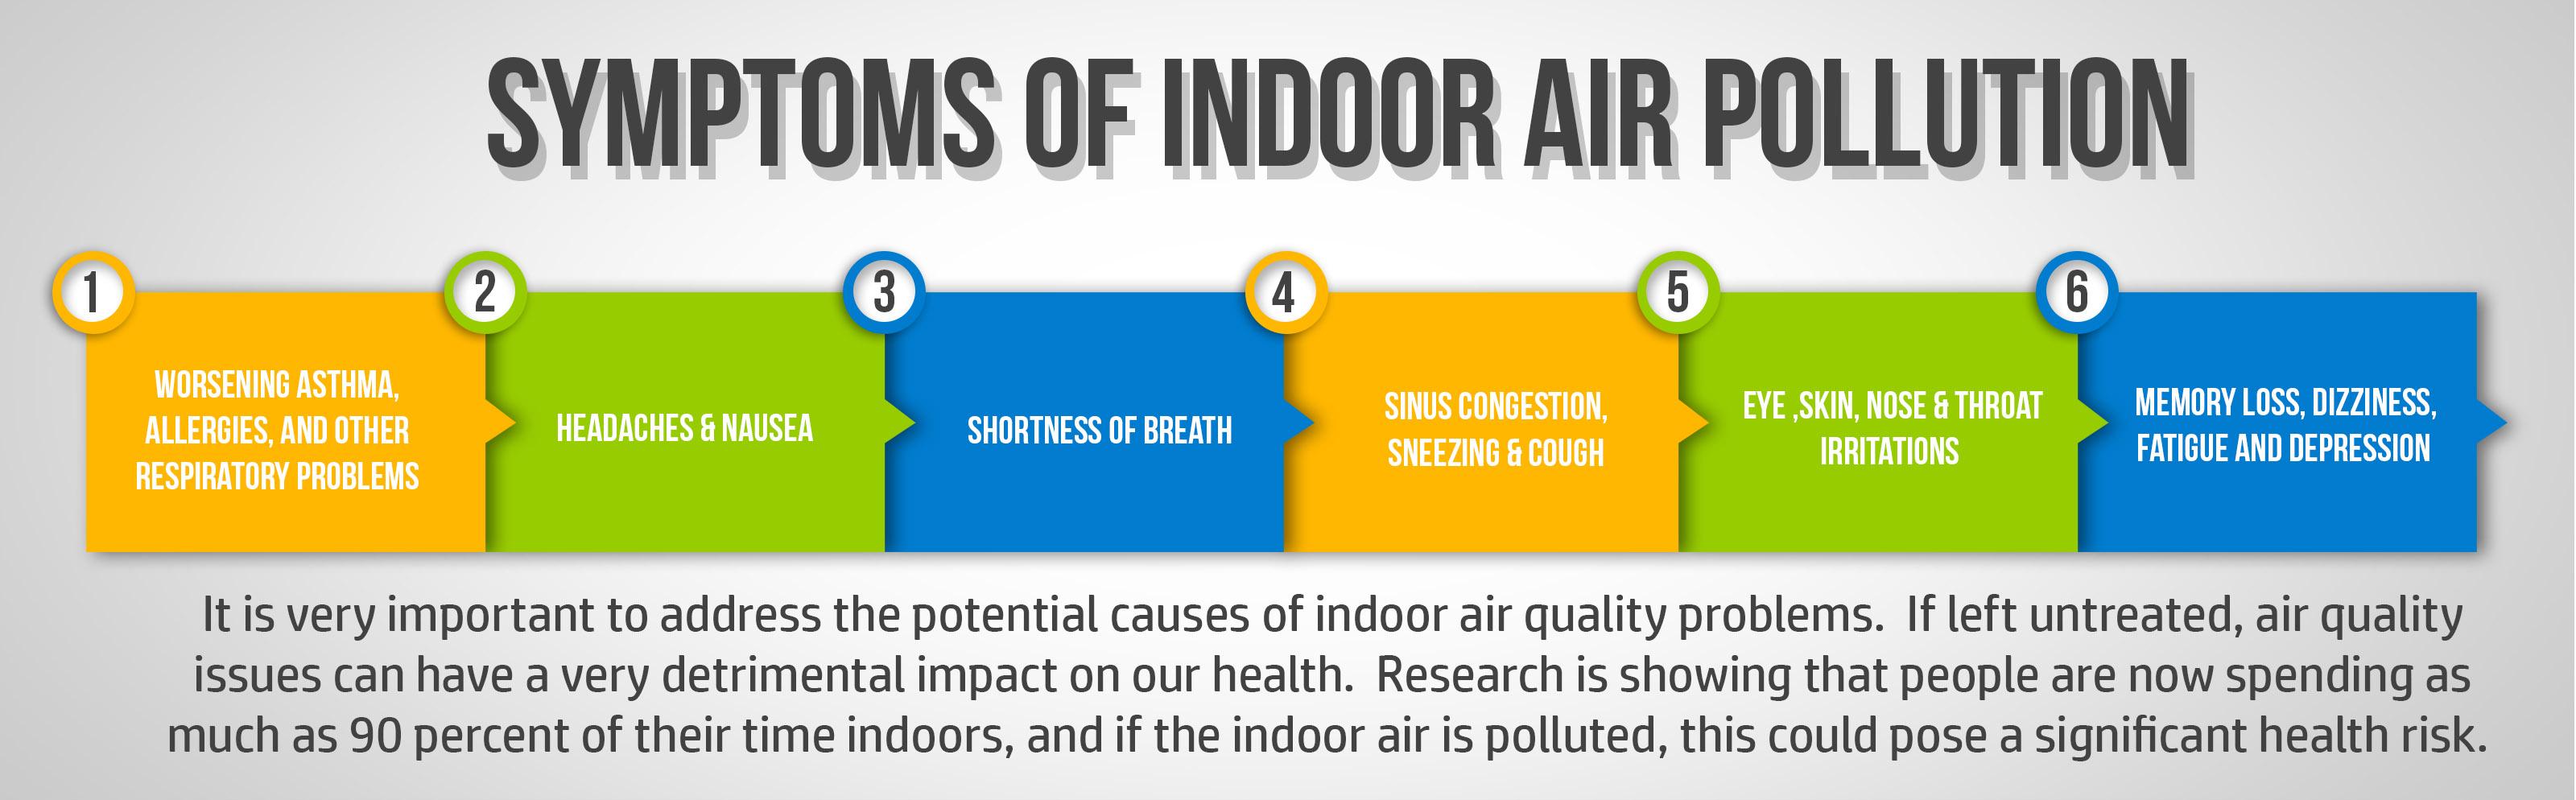 Symptoms Of Indoor Air Pollution Nirmitee Robotics